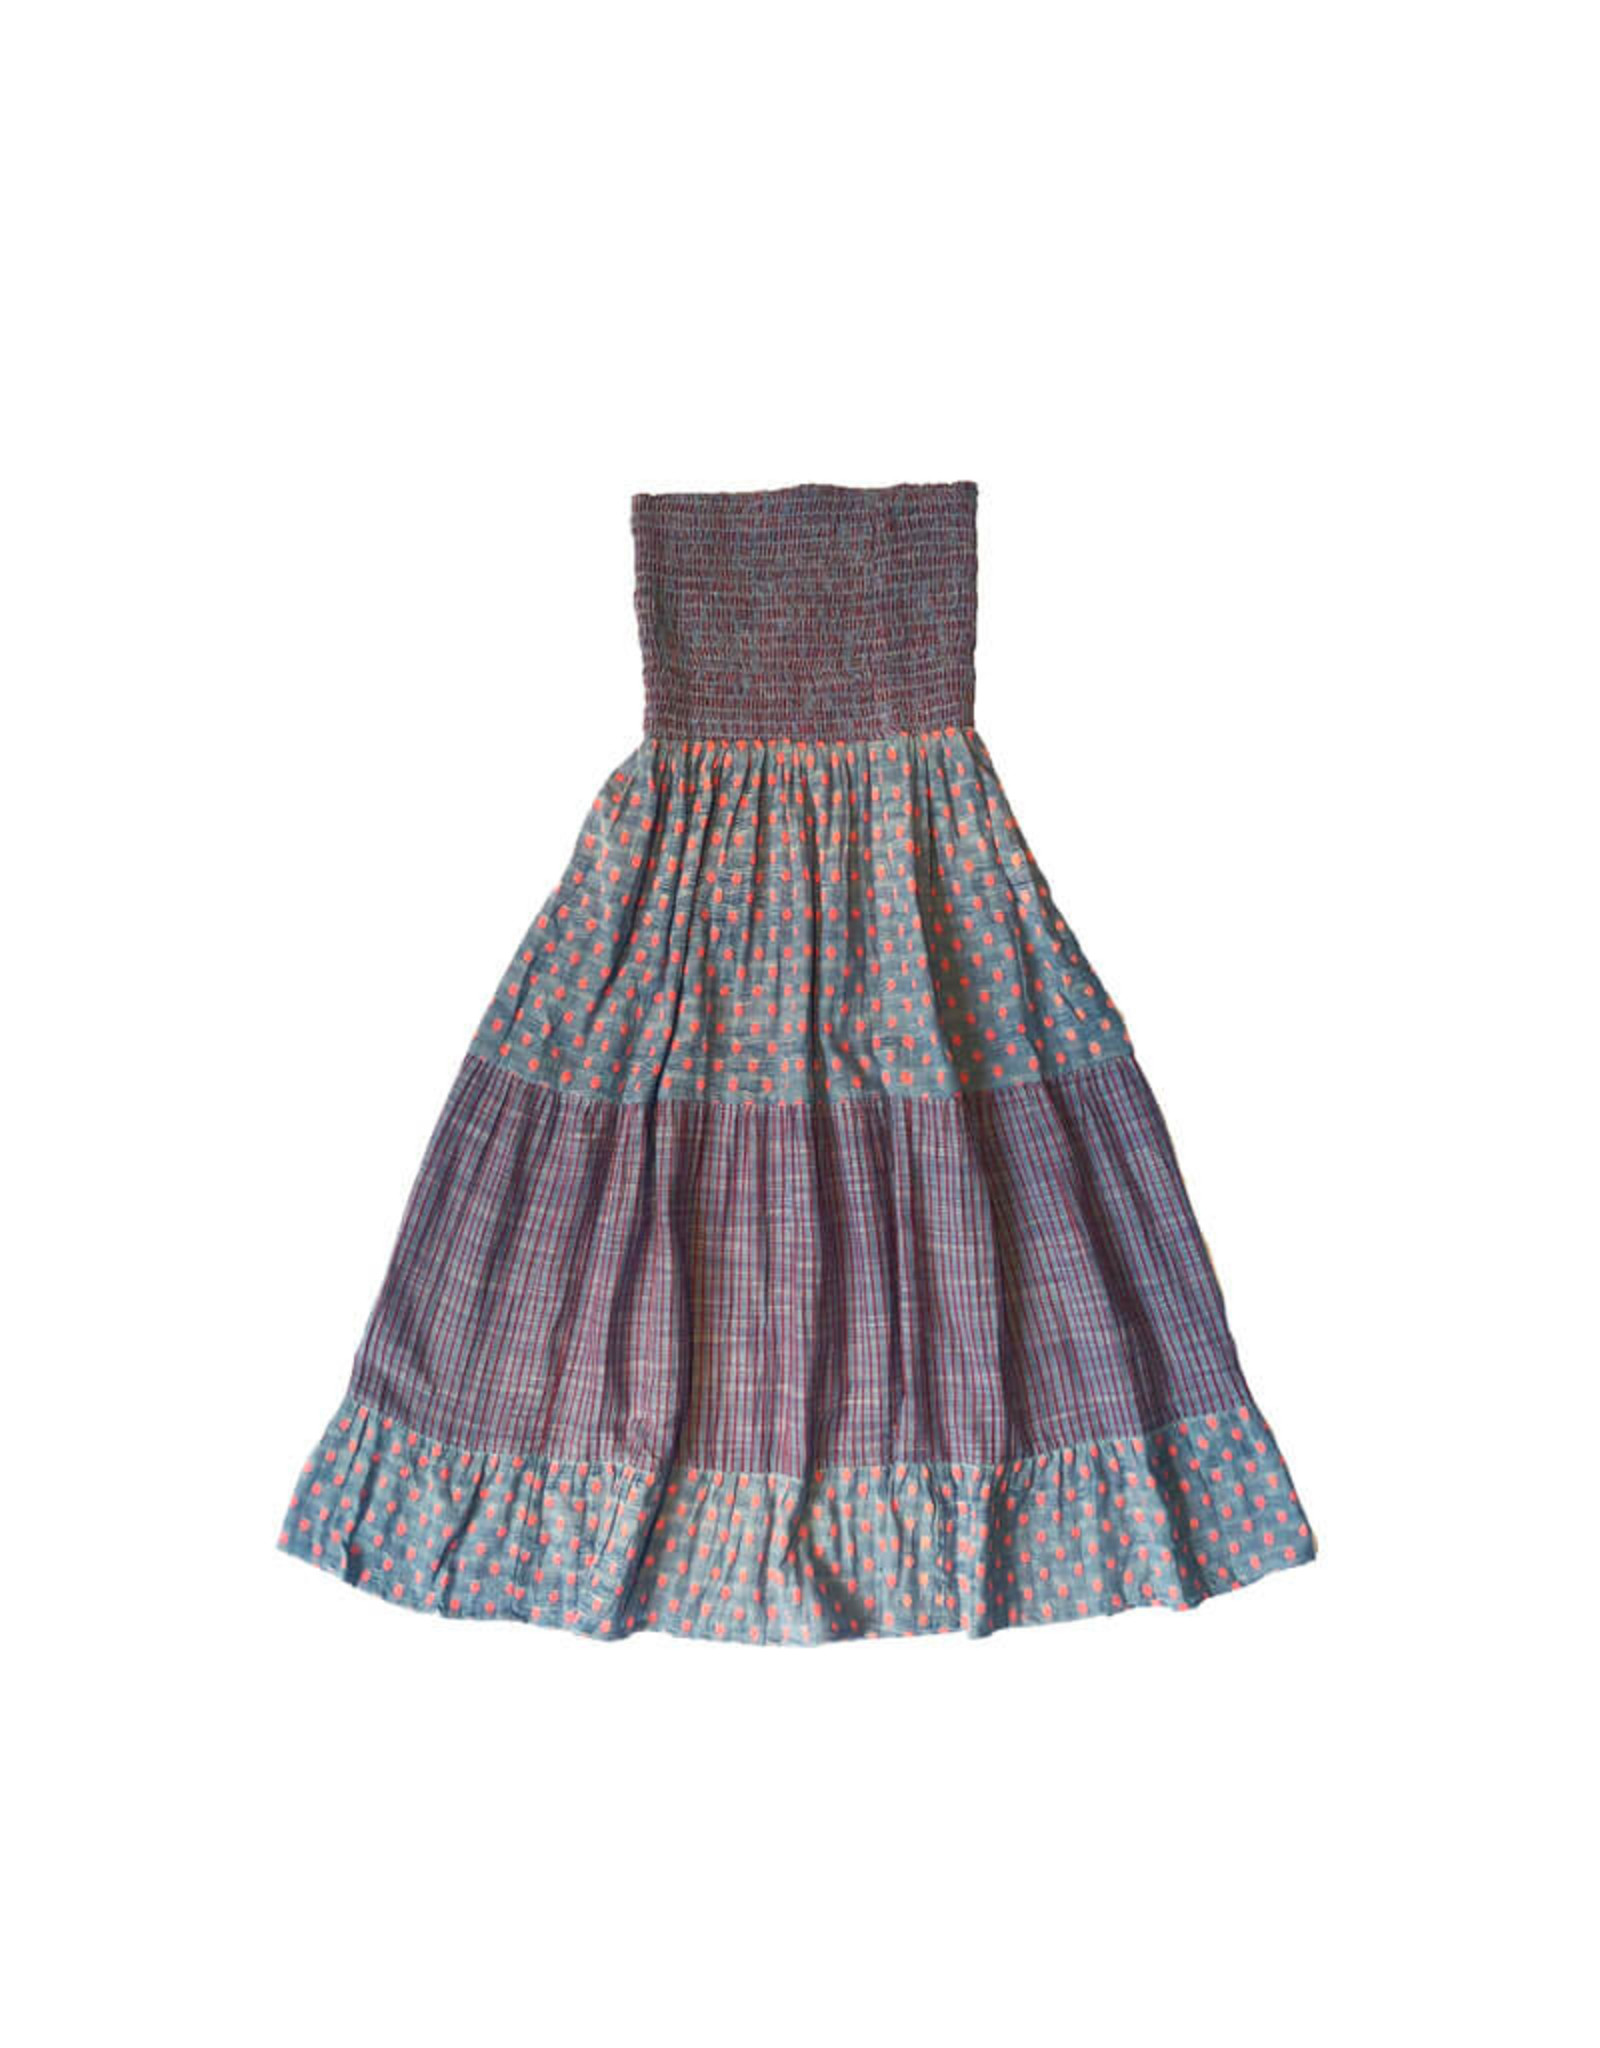 ace and jig daphne skirt